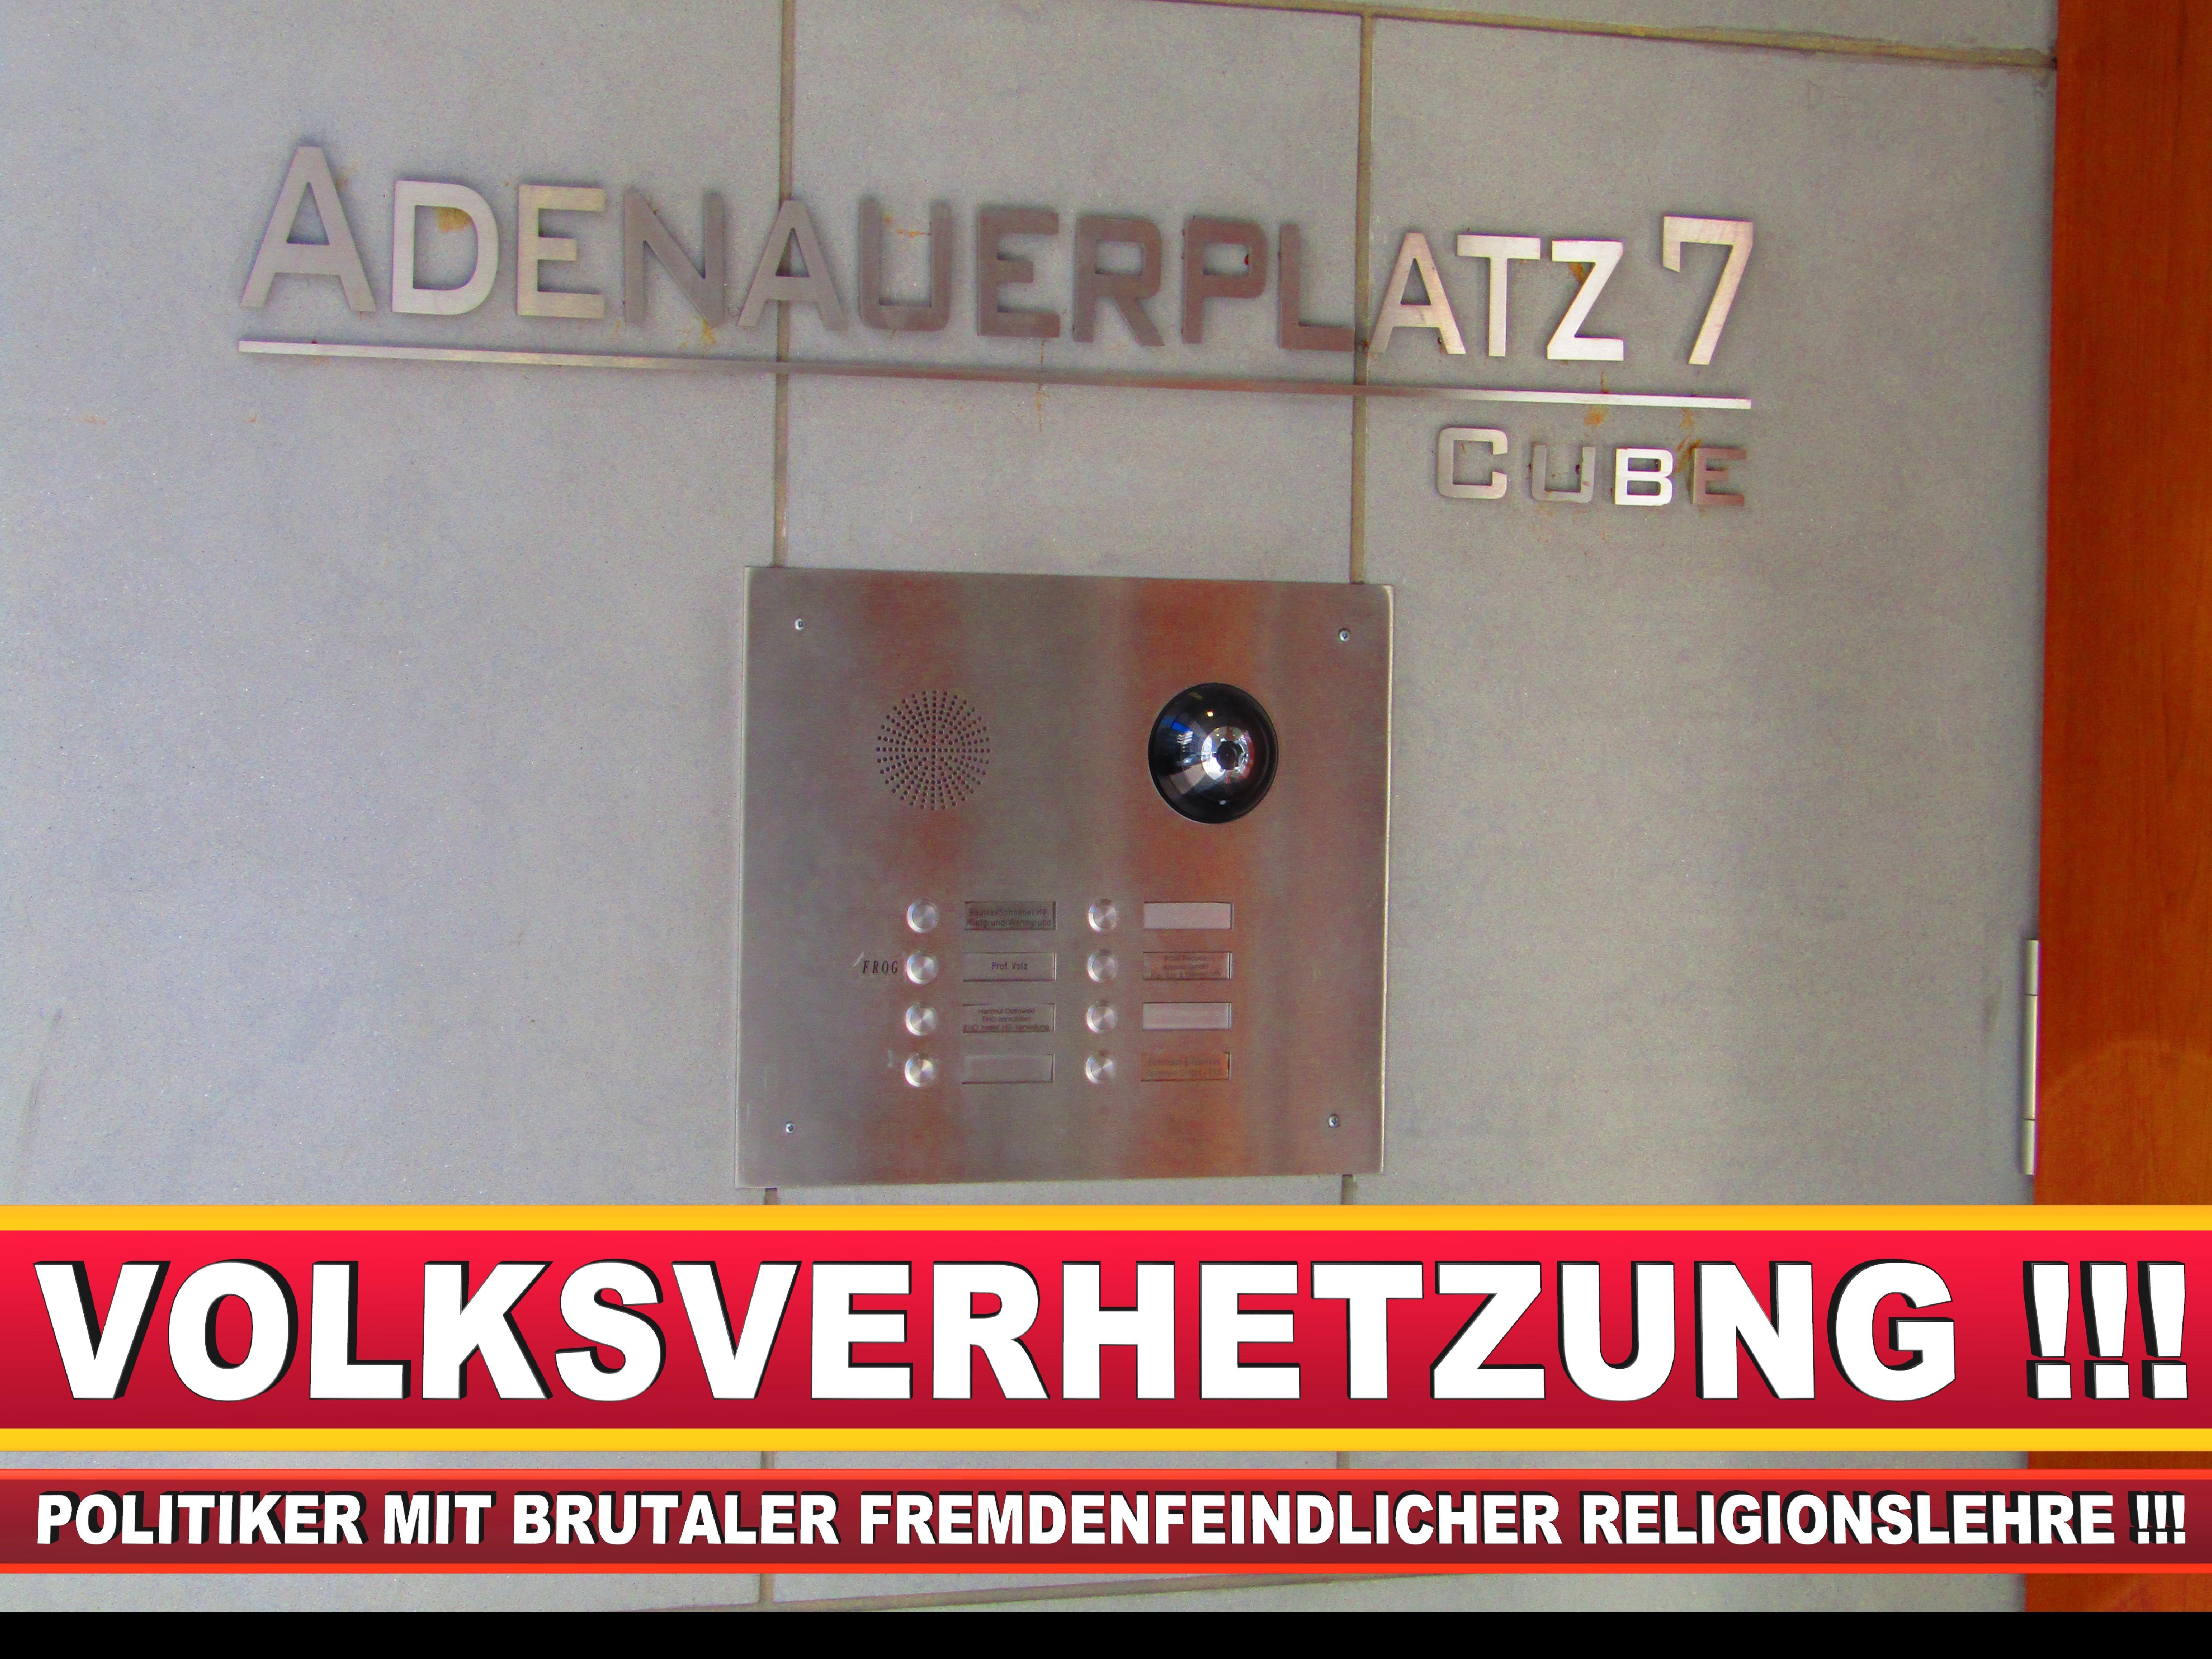 Rechtsanwalt Ralf Nettelstroth Adenauer Platz 7 Bielefeld CDU (7) Kopie